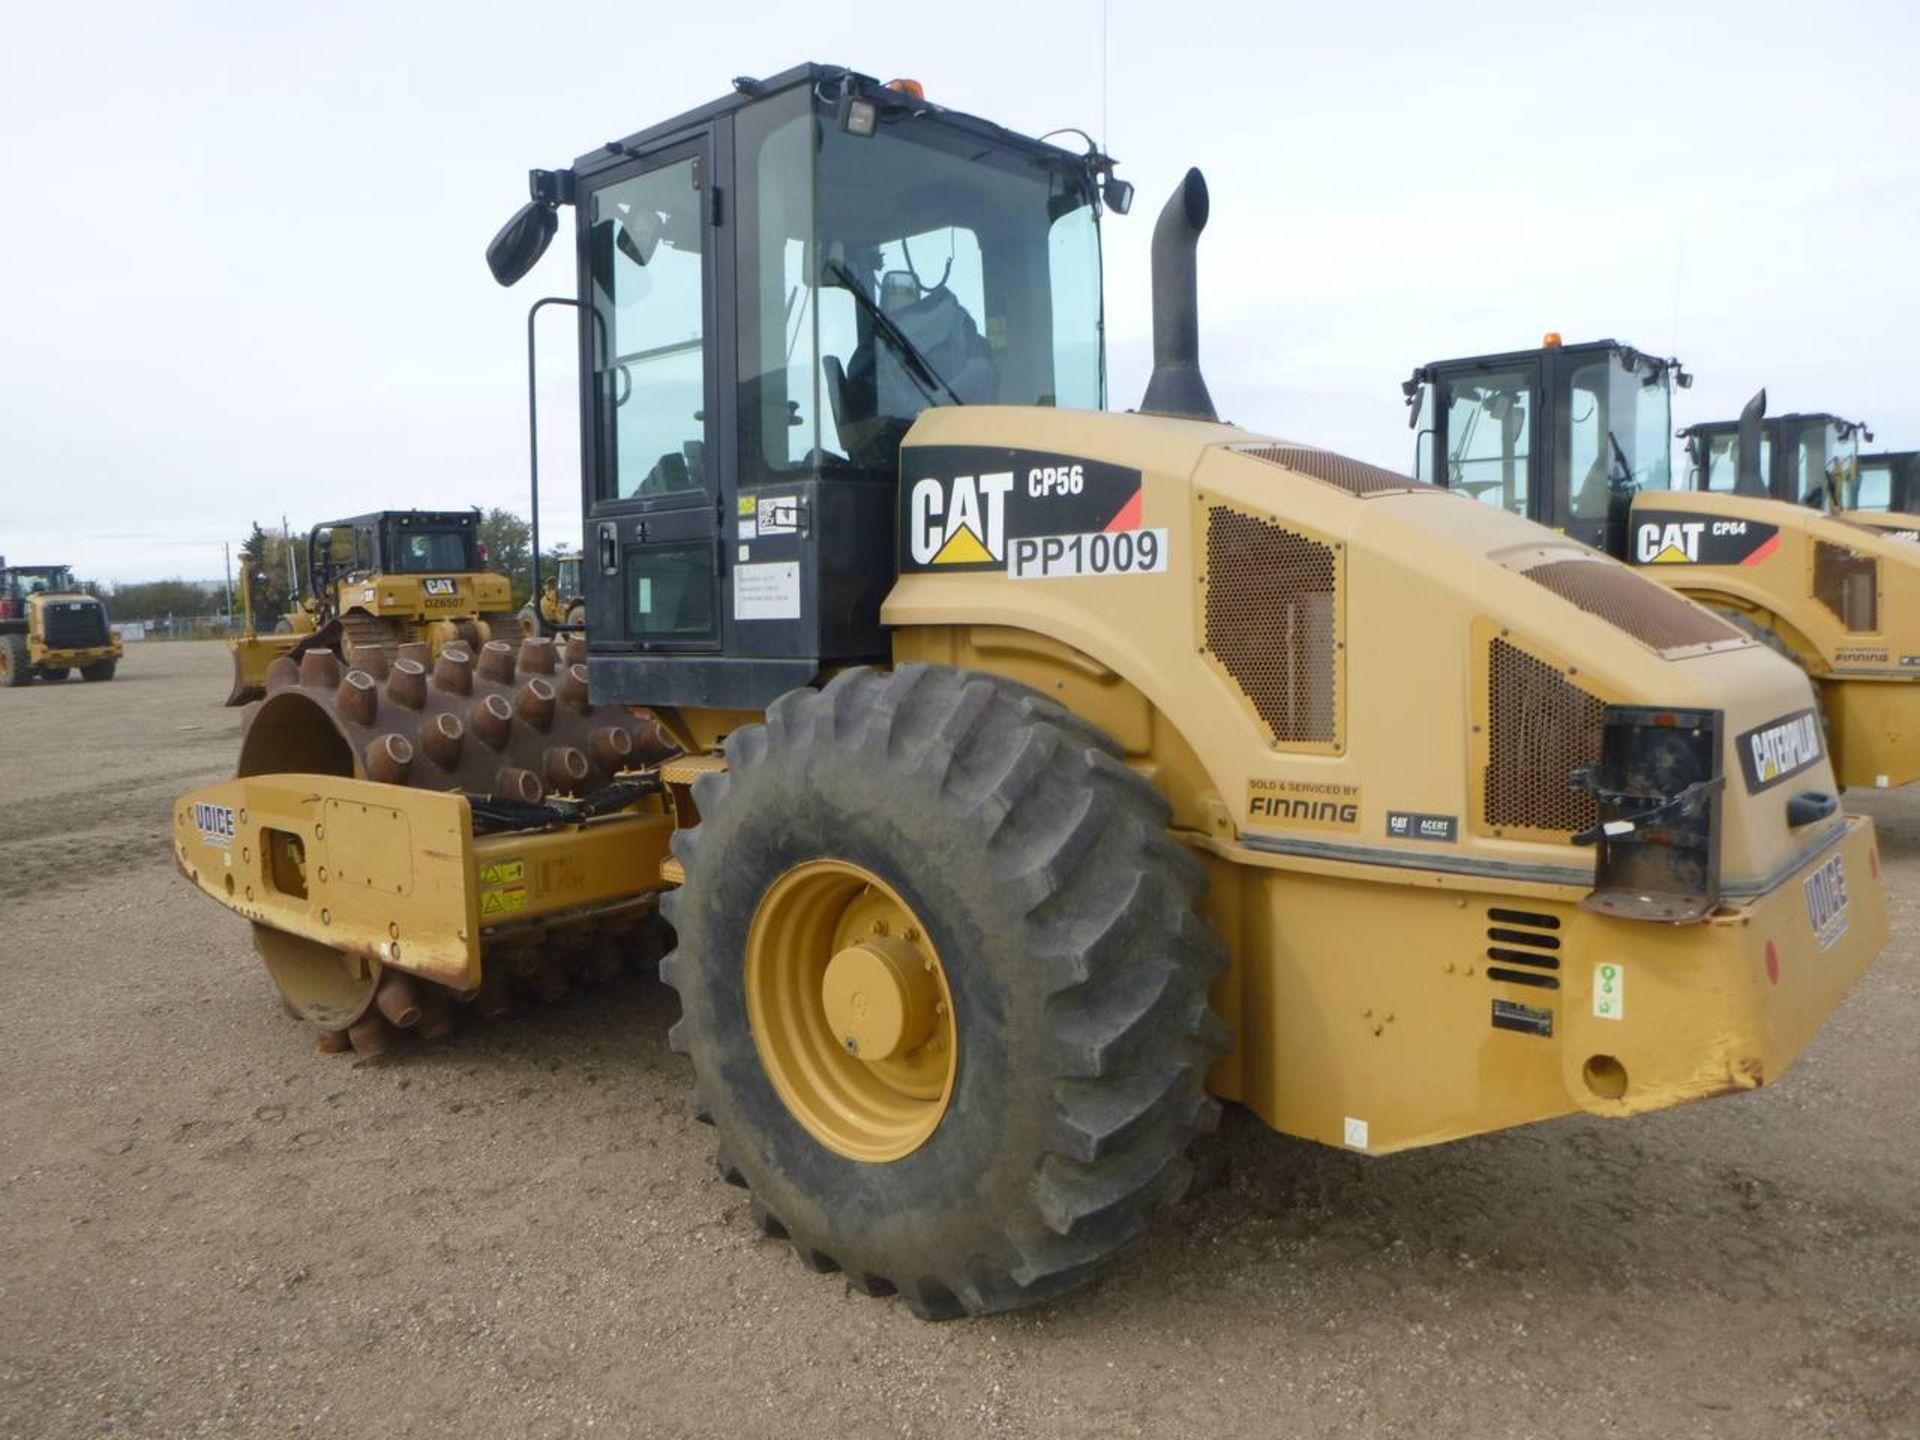 2009 Caterpillar CP56 Compactor - Image 4 of 9